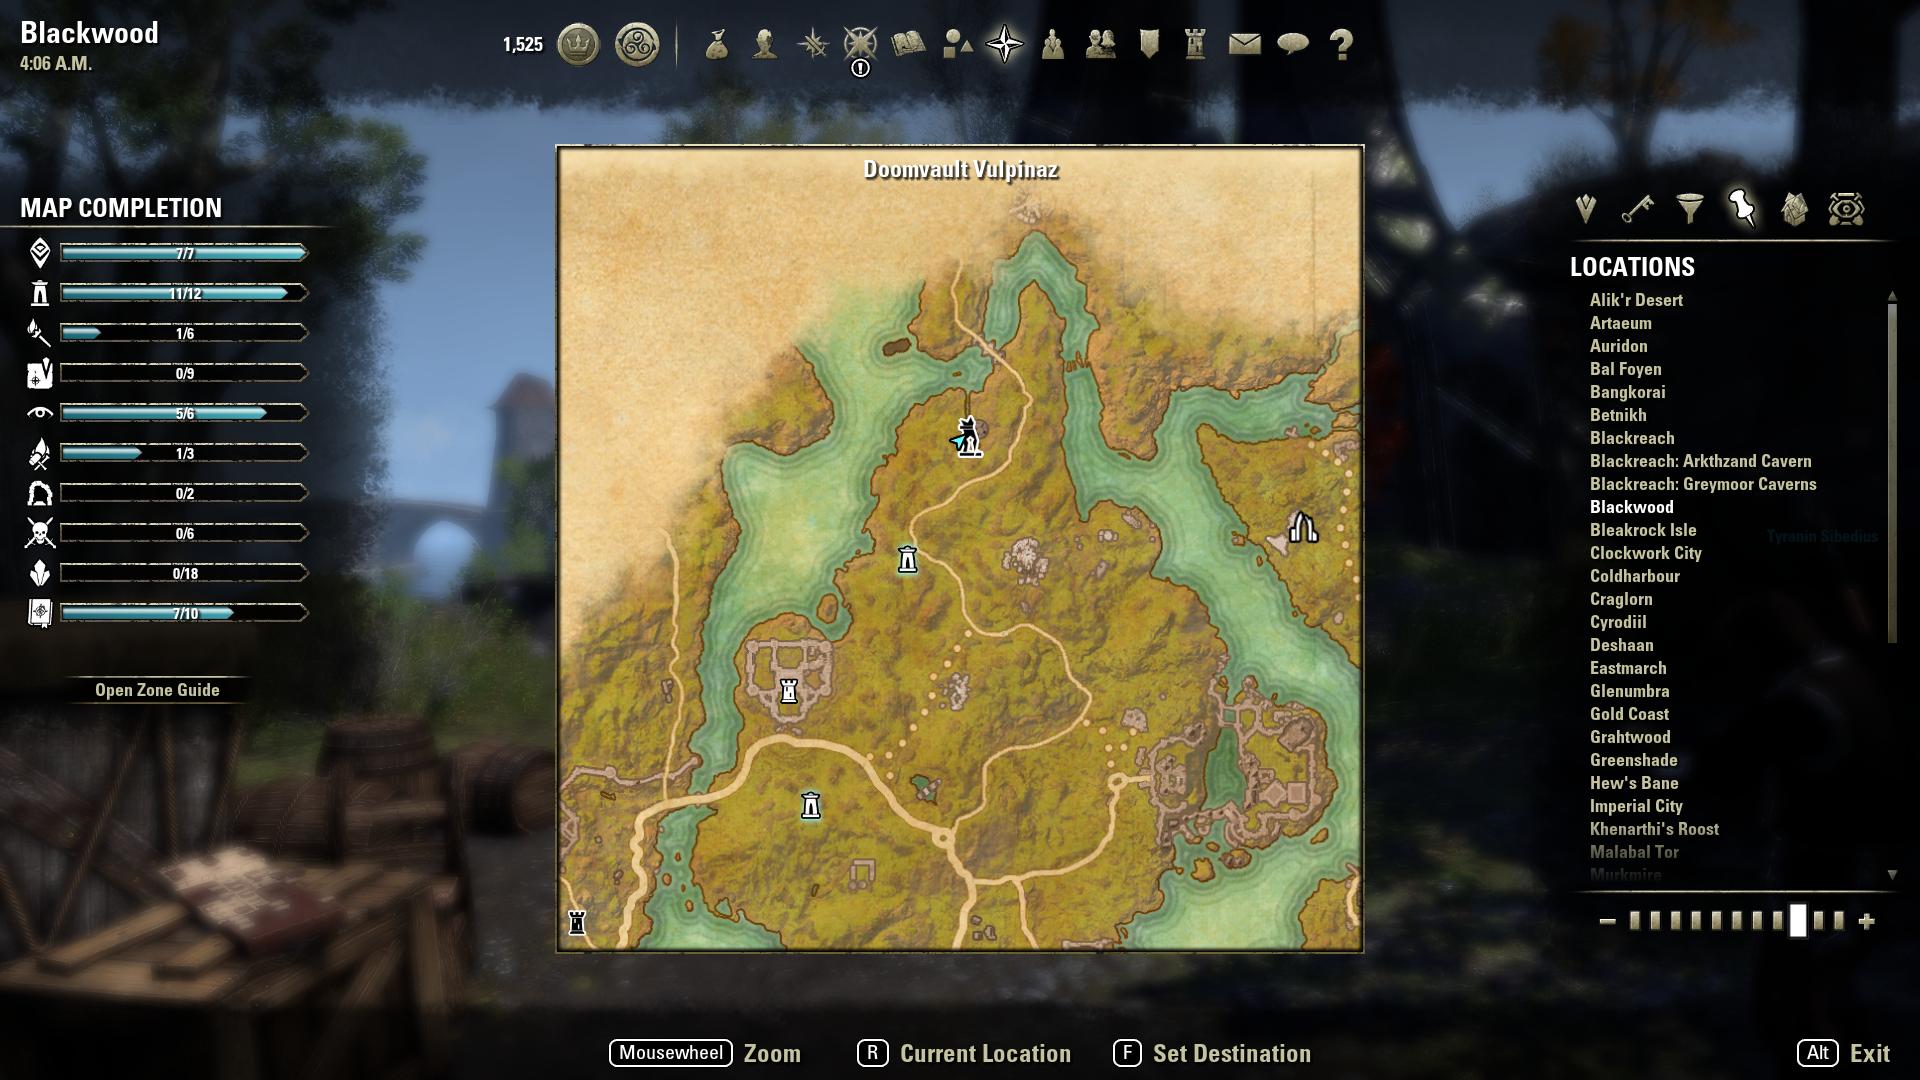 The Elder Scrolls Blackwood Companions Guide